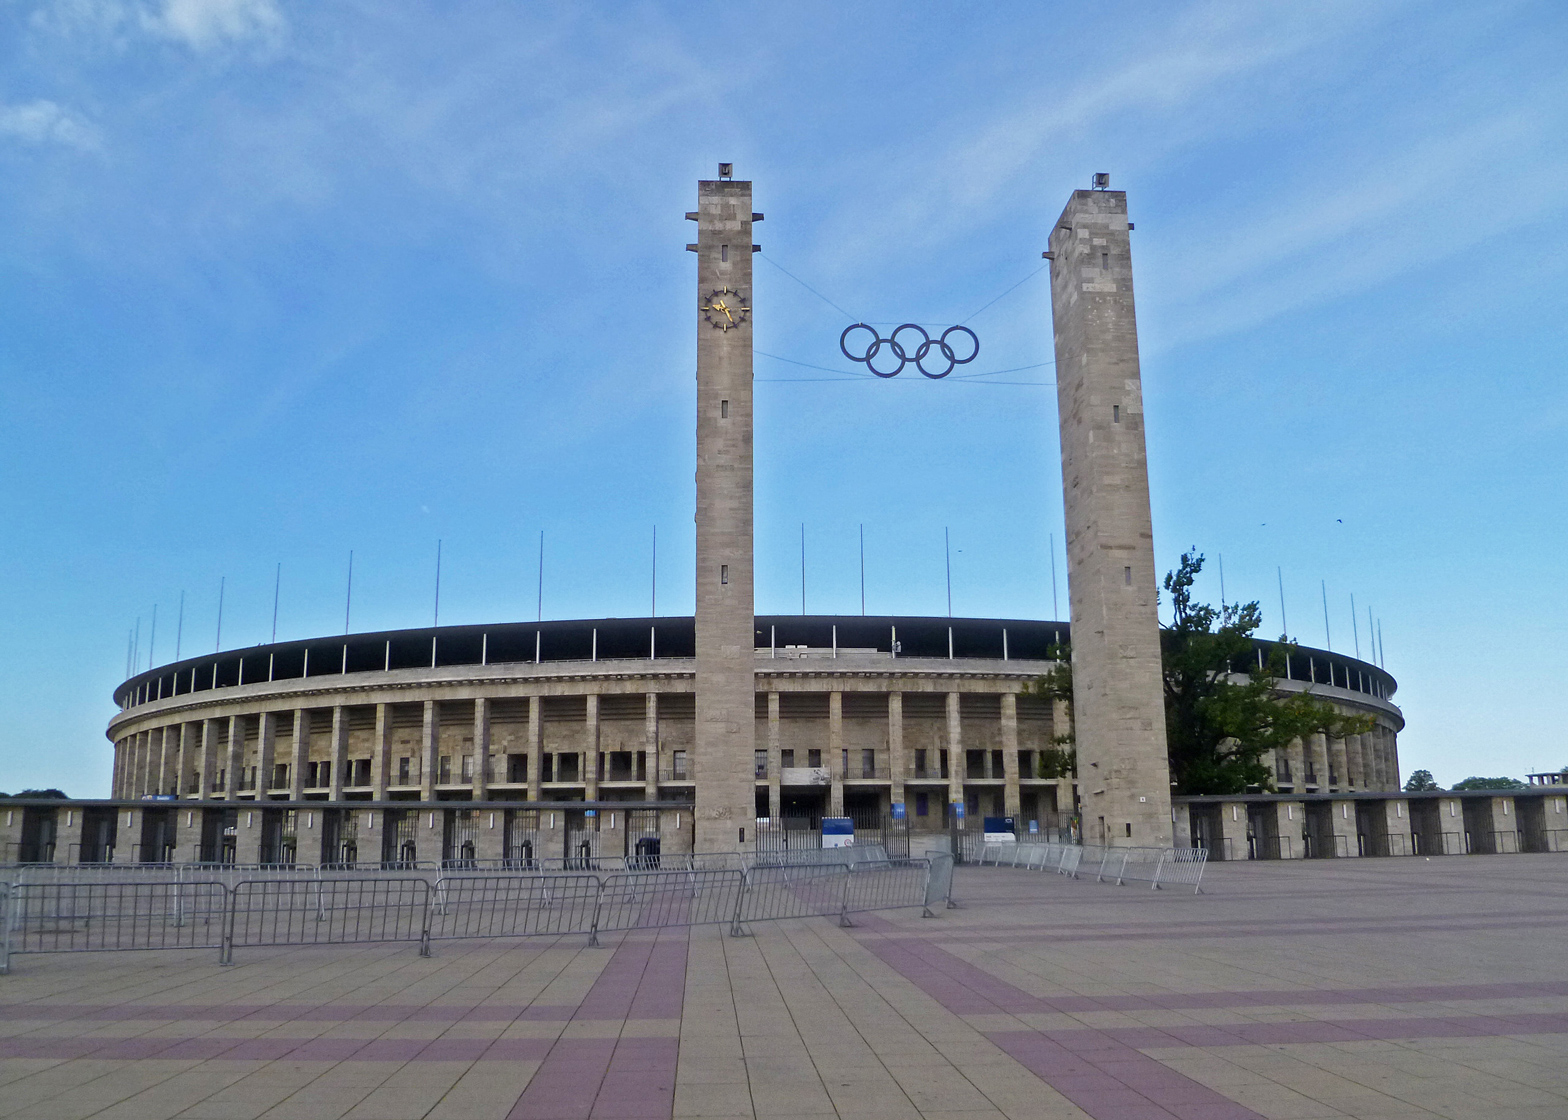 Olympiastadion by Werner March, Berlin 1936